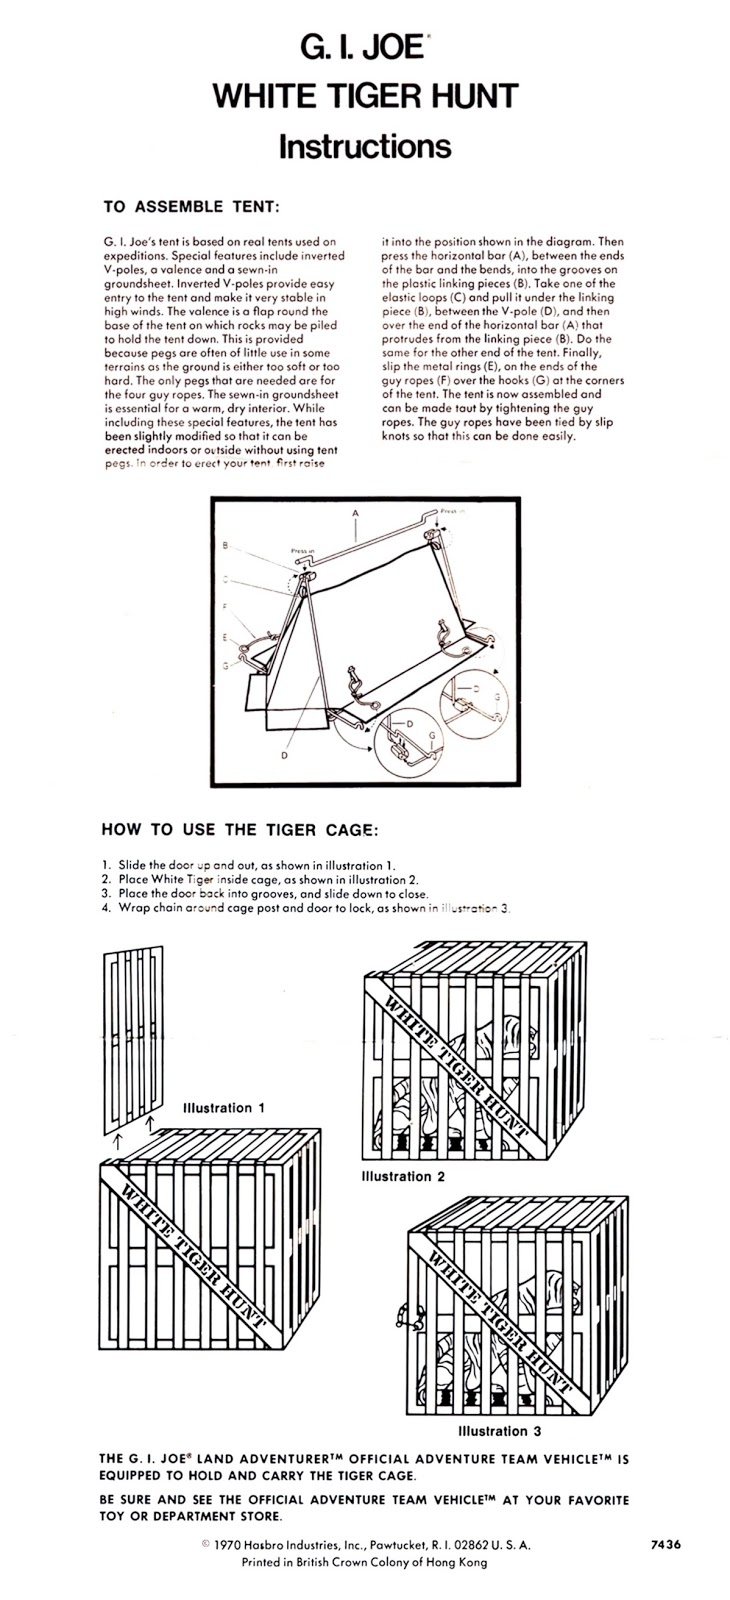 hight resolution of g i joe white tiger hunt instructions aiwaloki s lair tiger skeleton diagram white tiger diagram